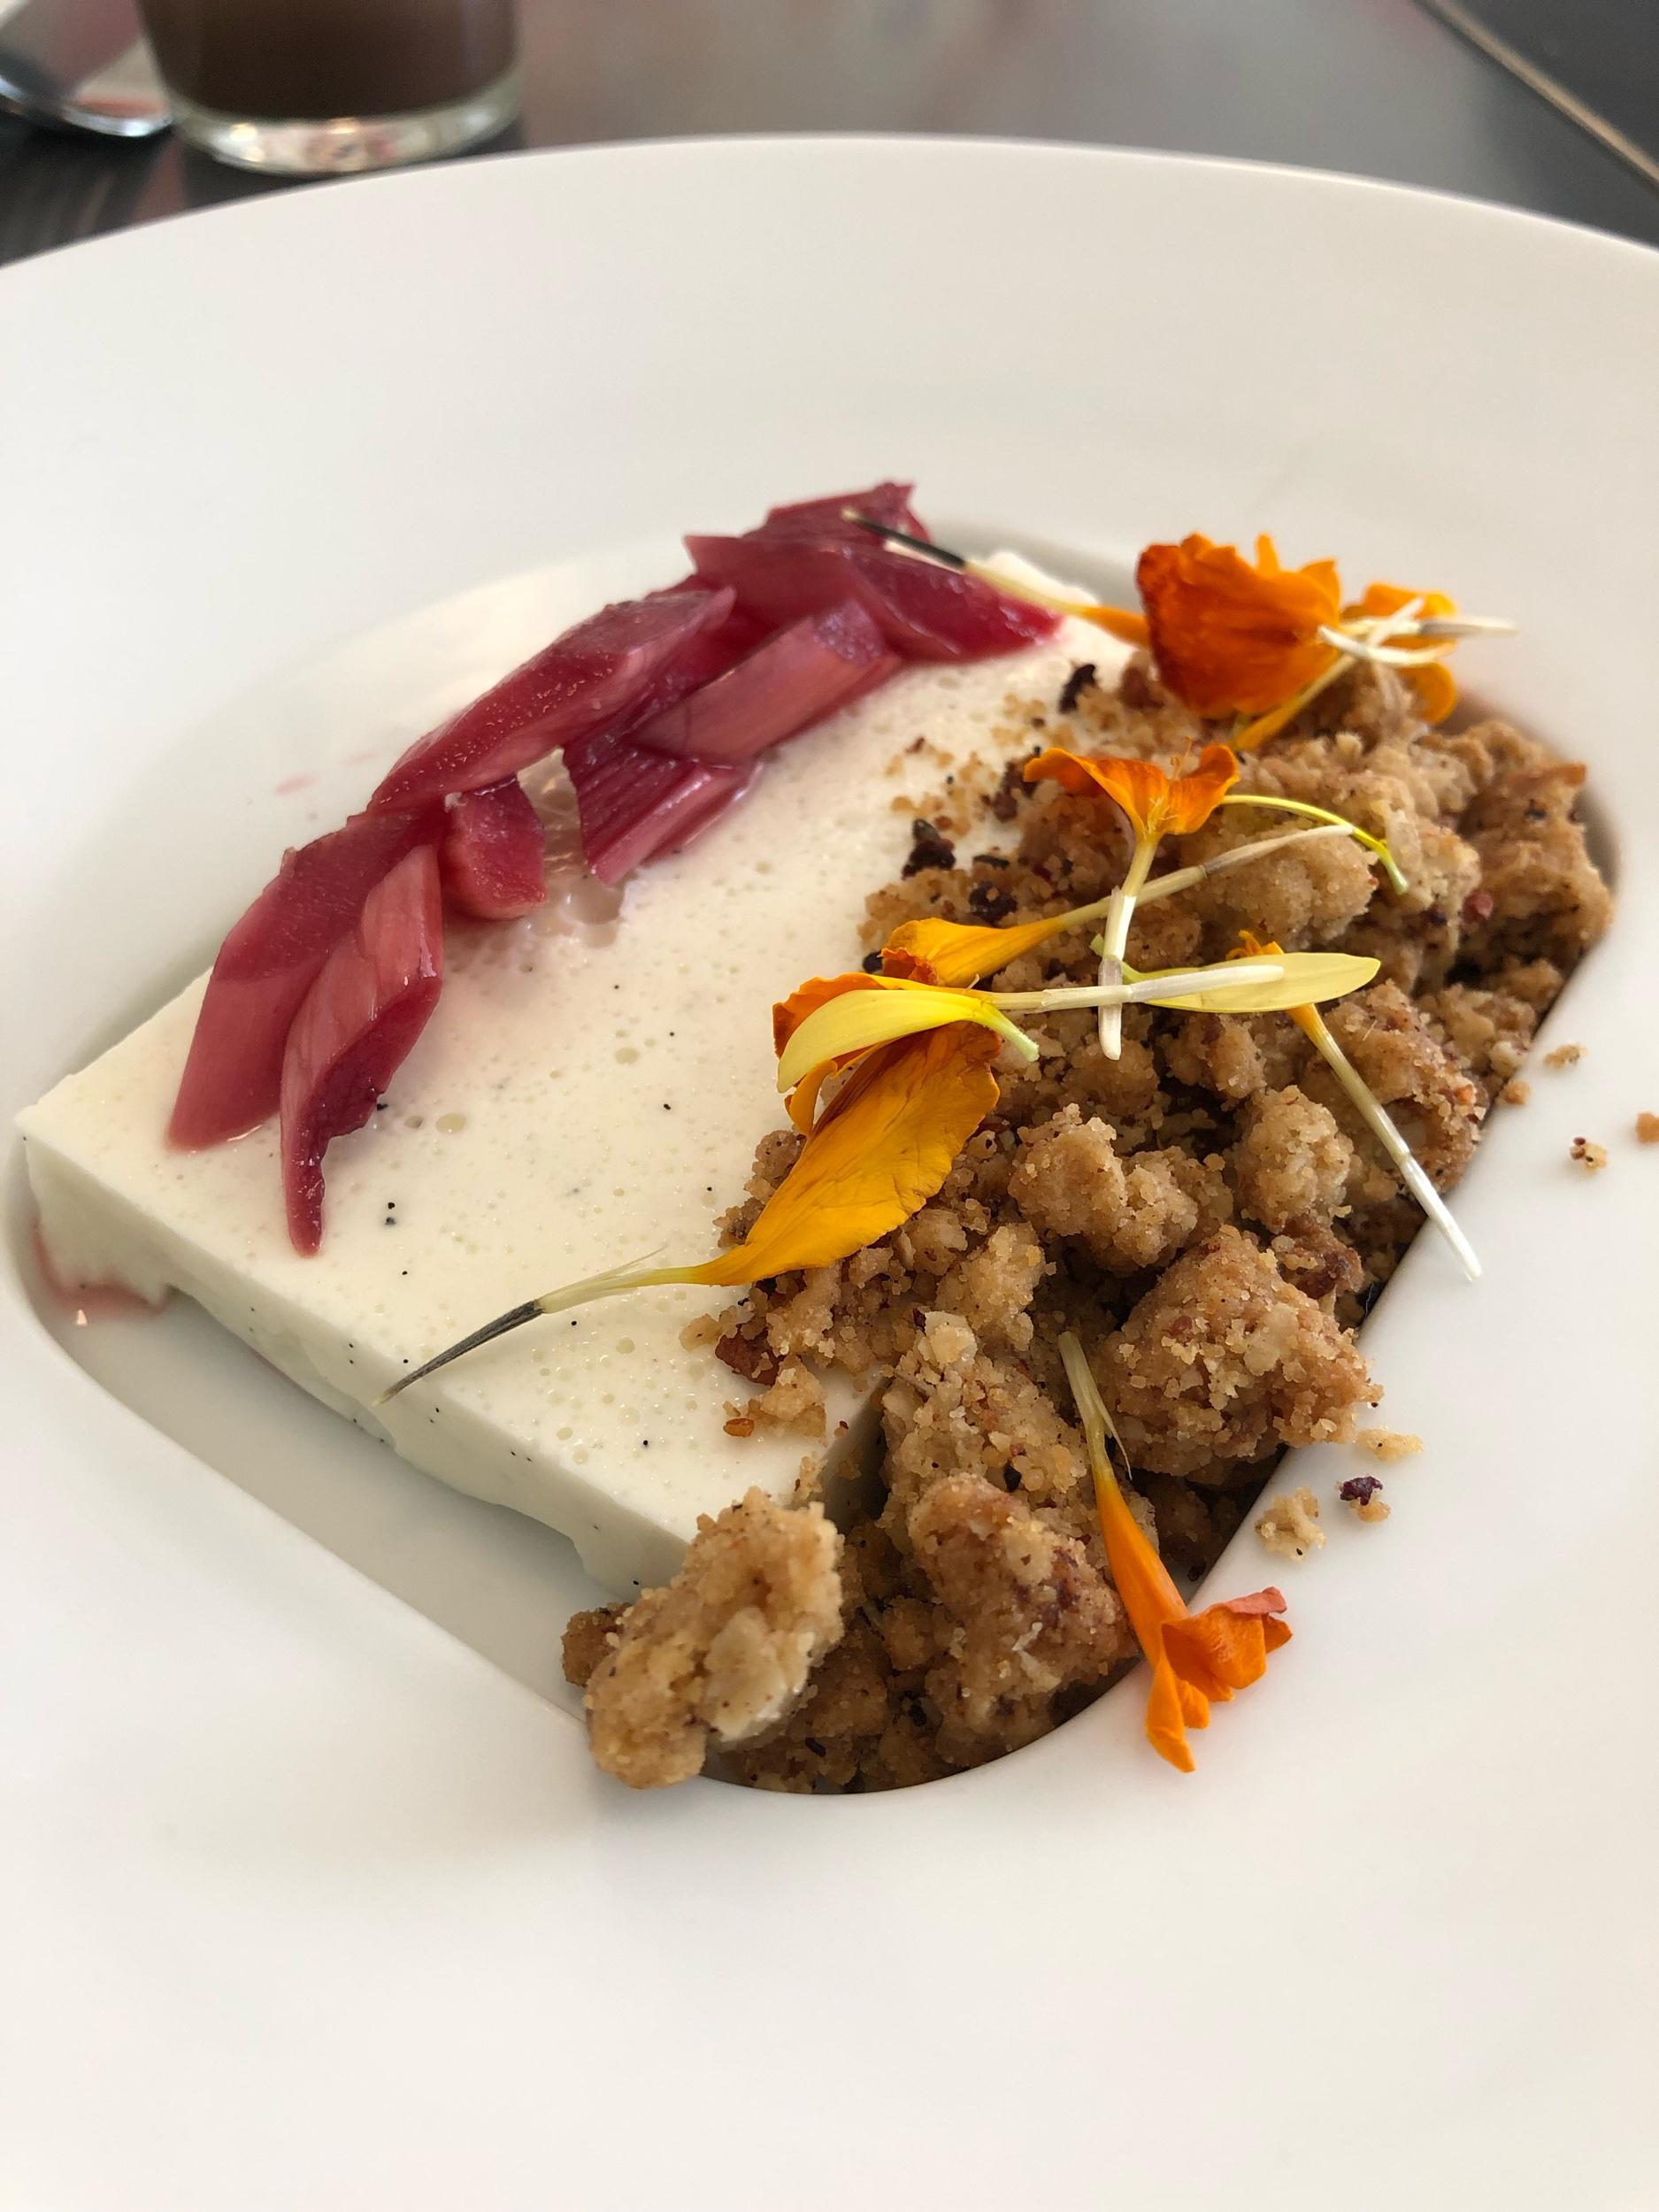 Panna Cotta with rhubarb and granola